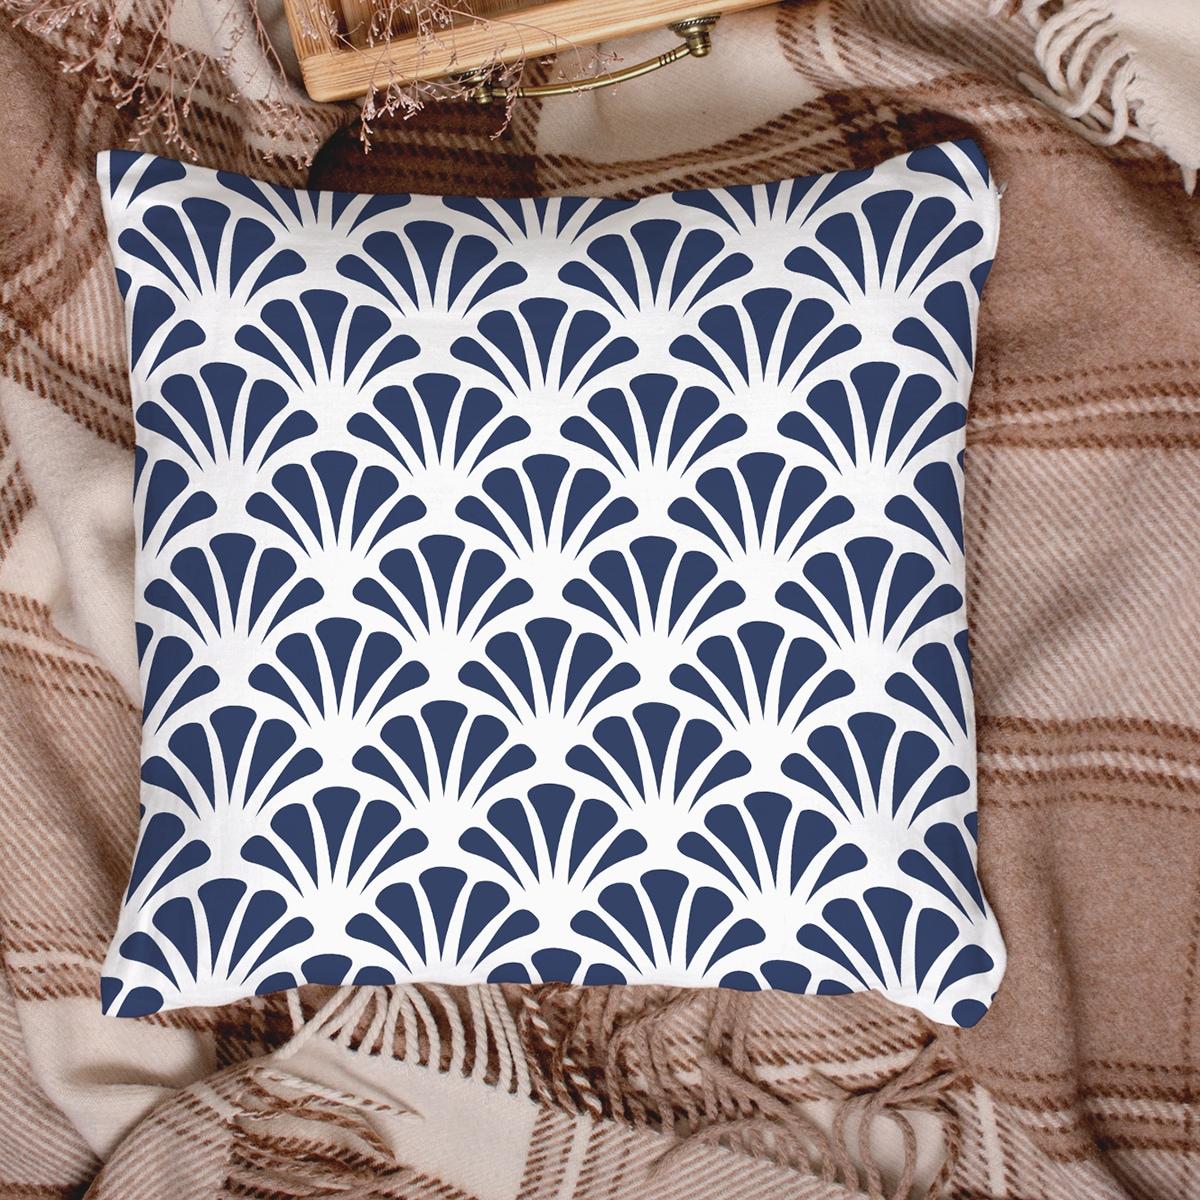 Чехол для подушки с геометрическим узором без наполнителя фото